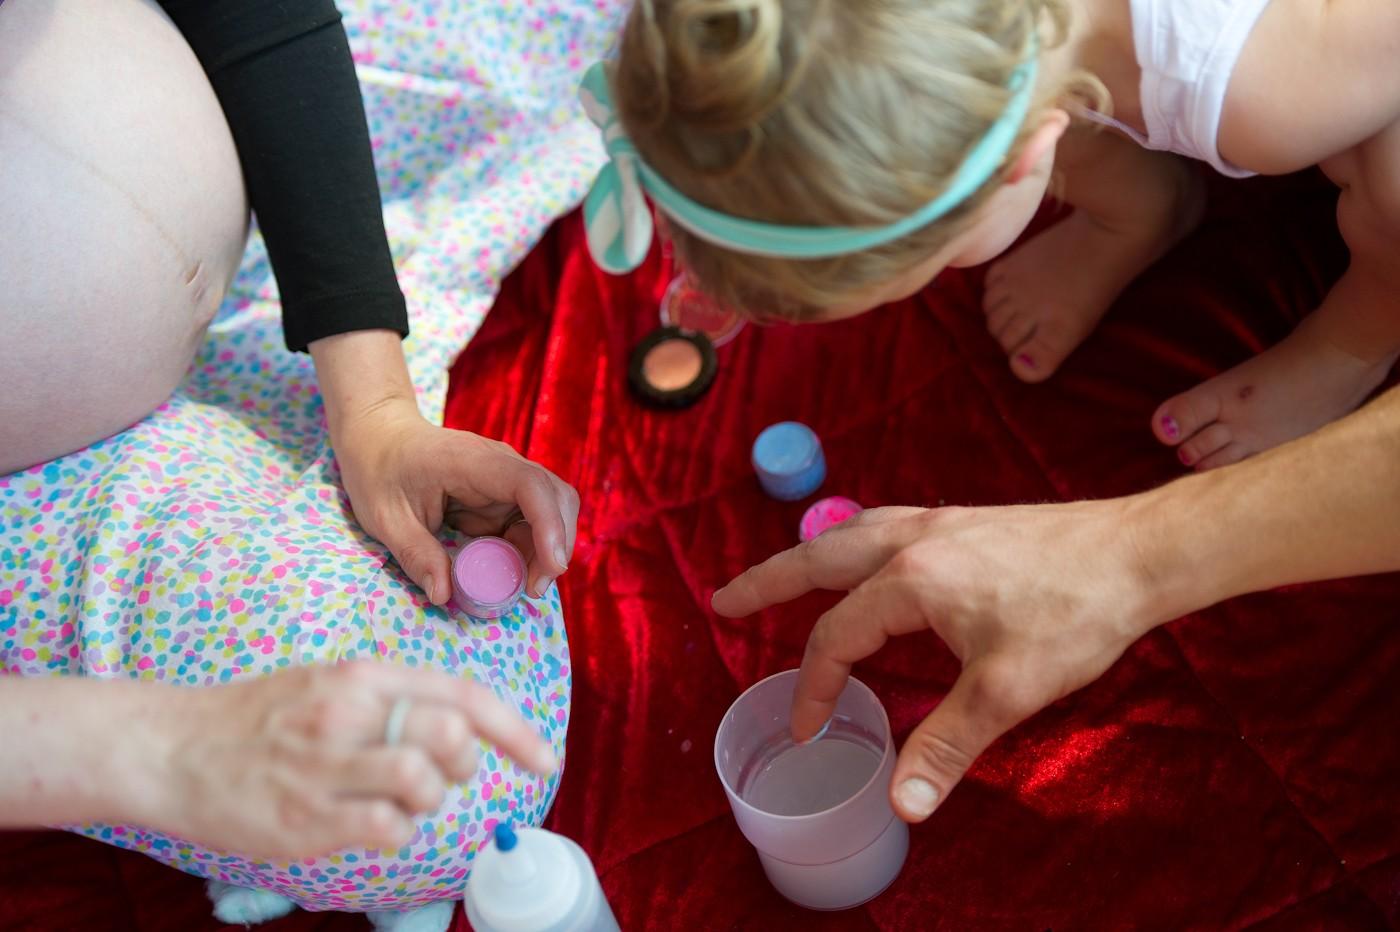 Body Paint inspired Family Maternity Photoshoot